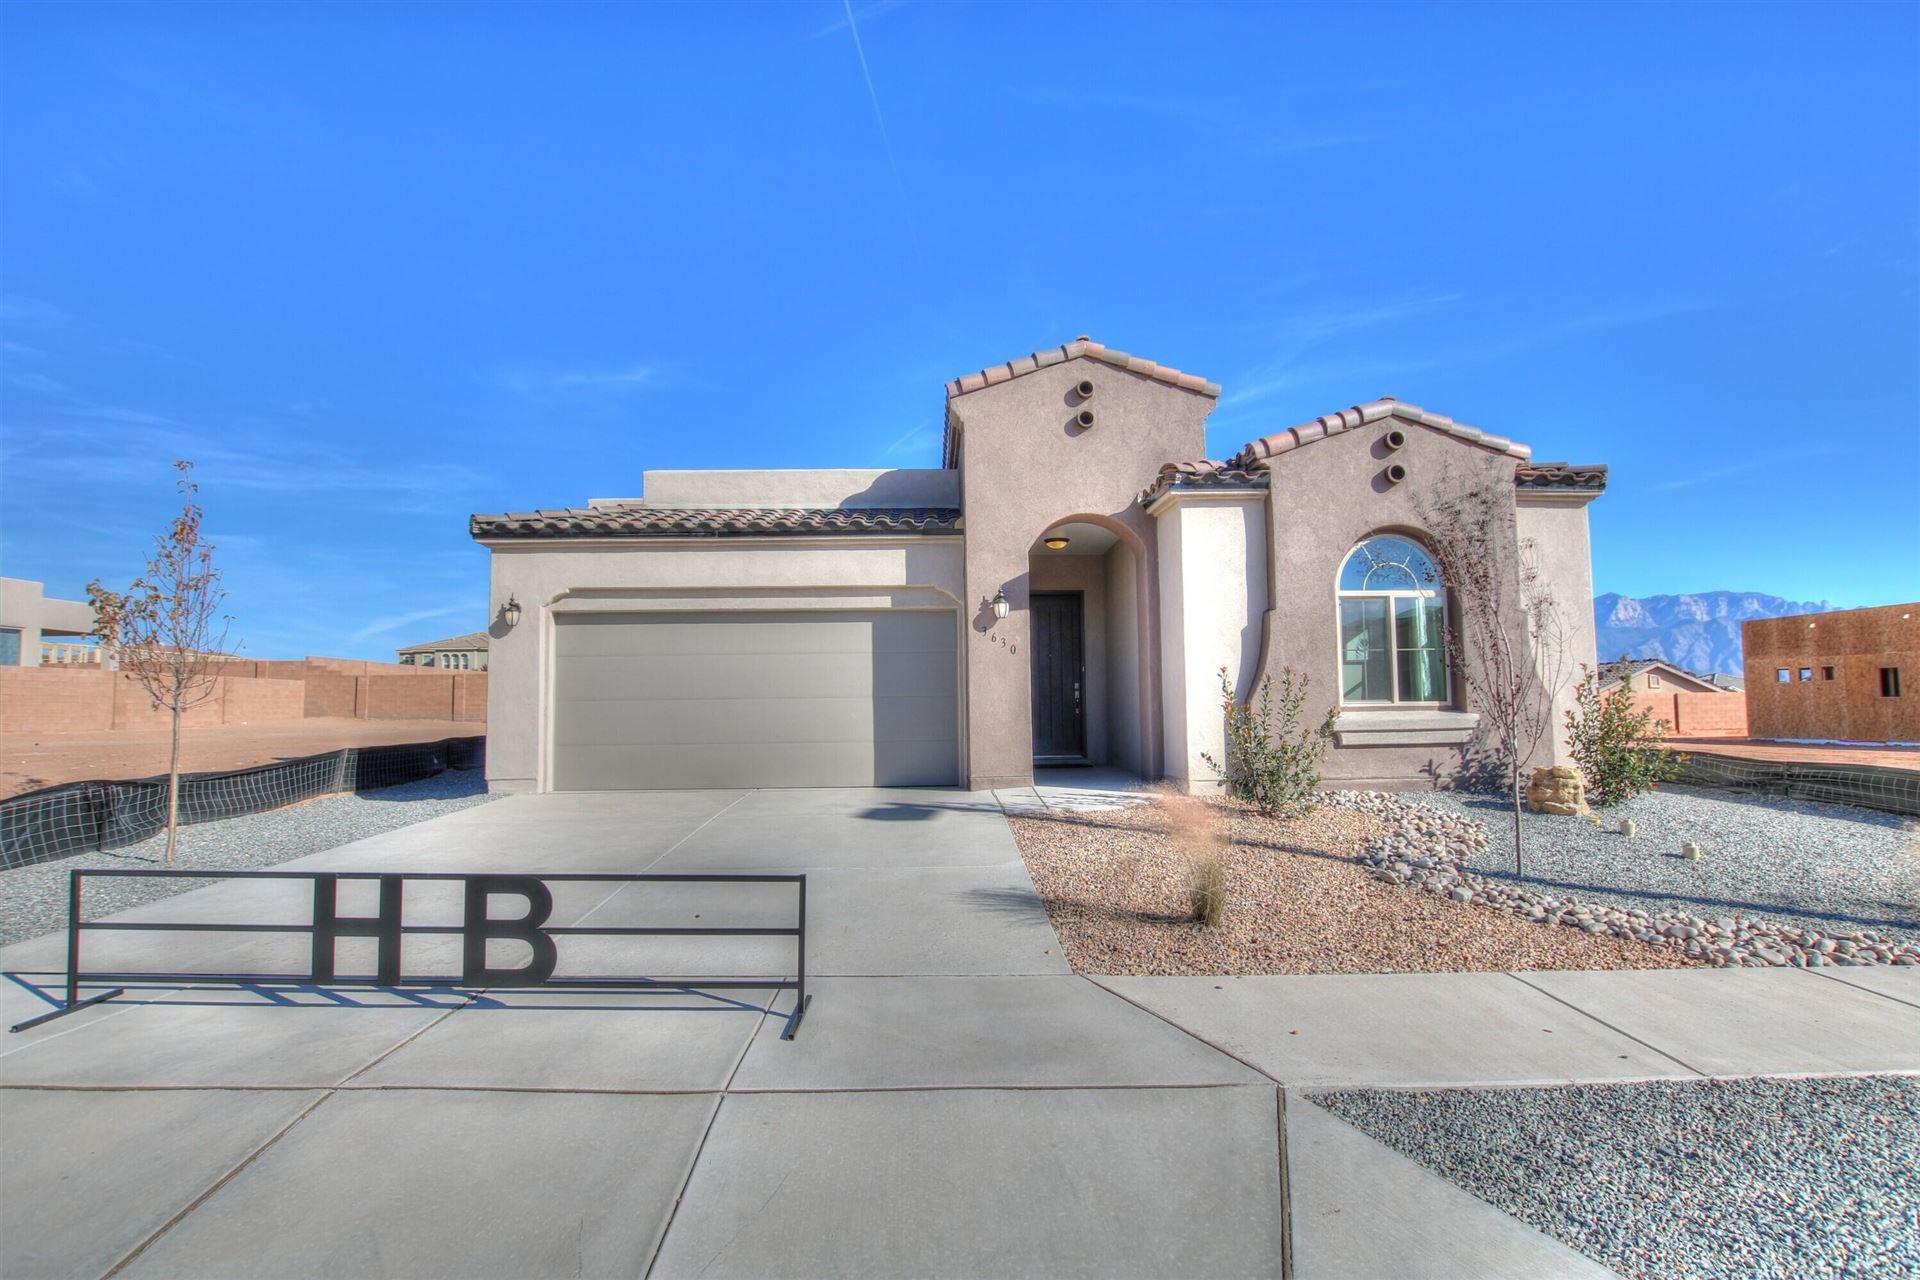 7106 Eagle Rock Court NE, Rio Rancho, NM 87144 - MLS#: 986562